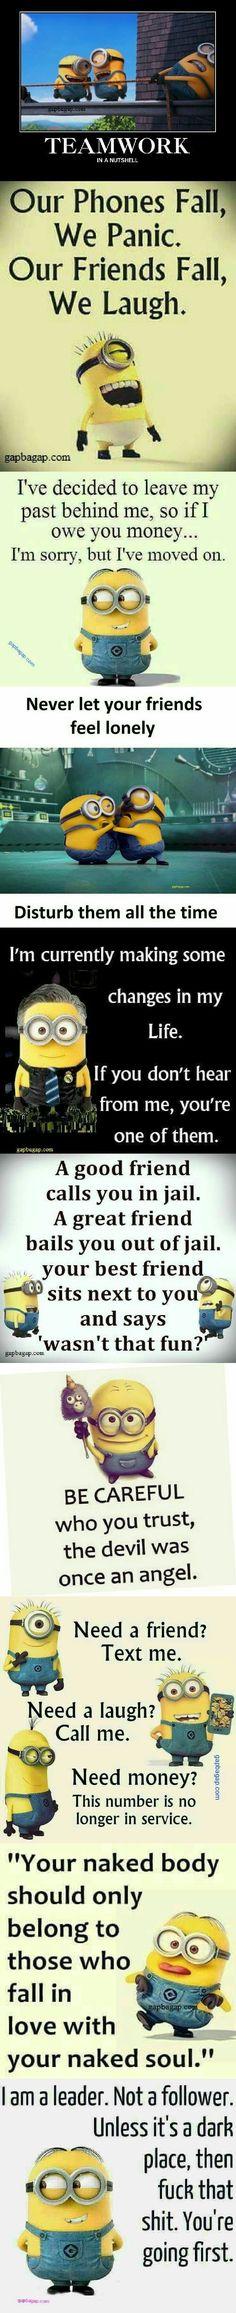 Top 10 Funniest Minion Memes About Friends